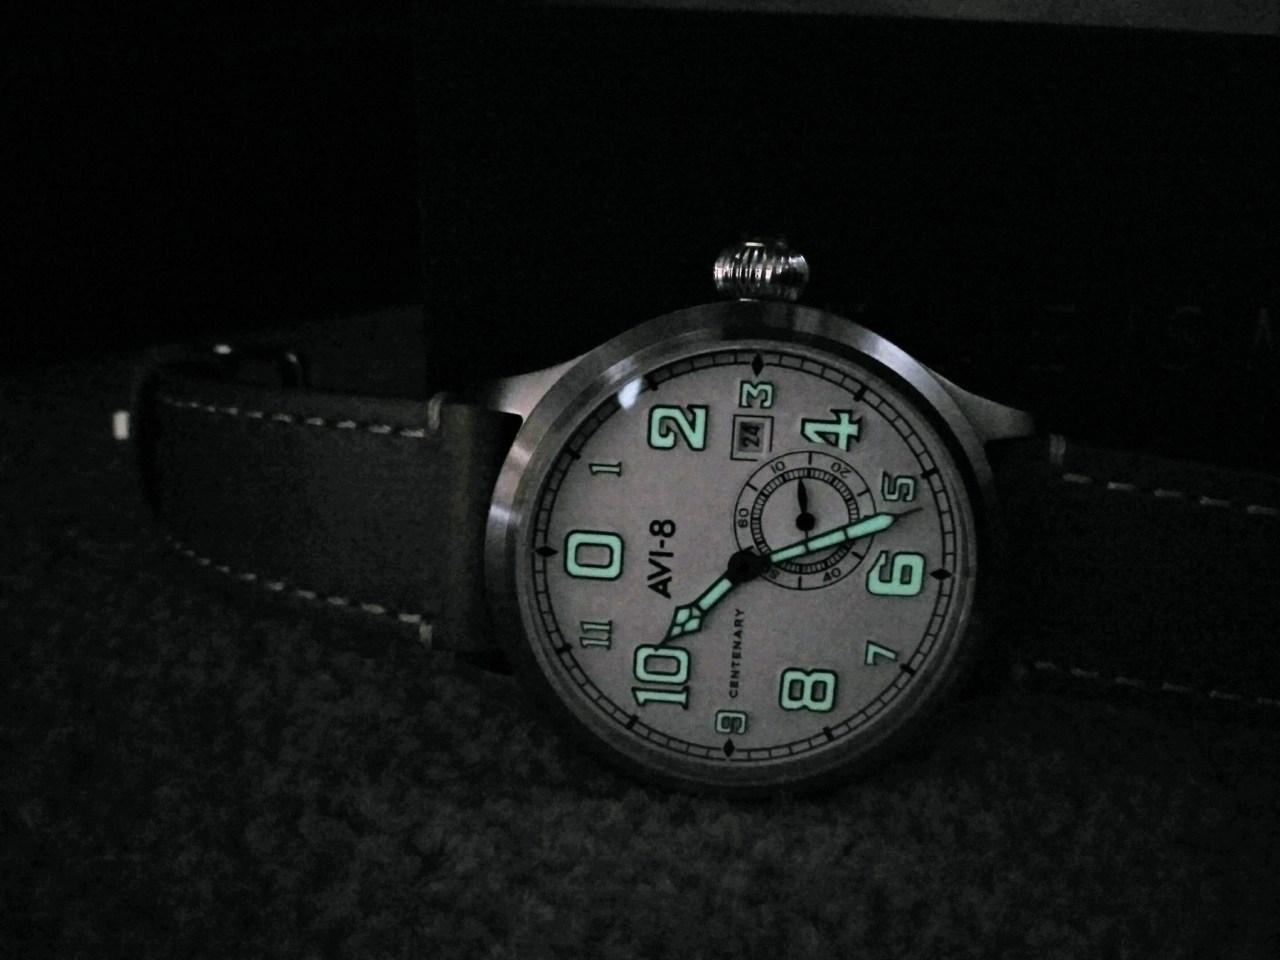 AVI-8 Centenary 1920 RAF Automatic Watch